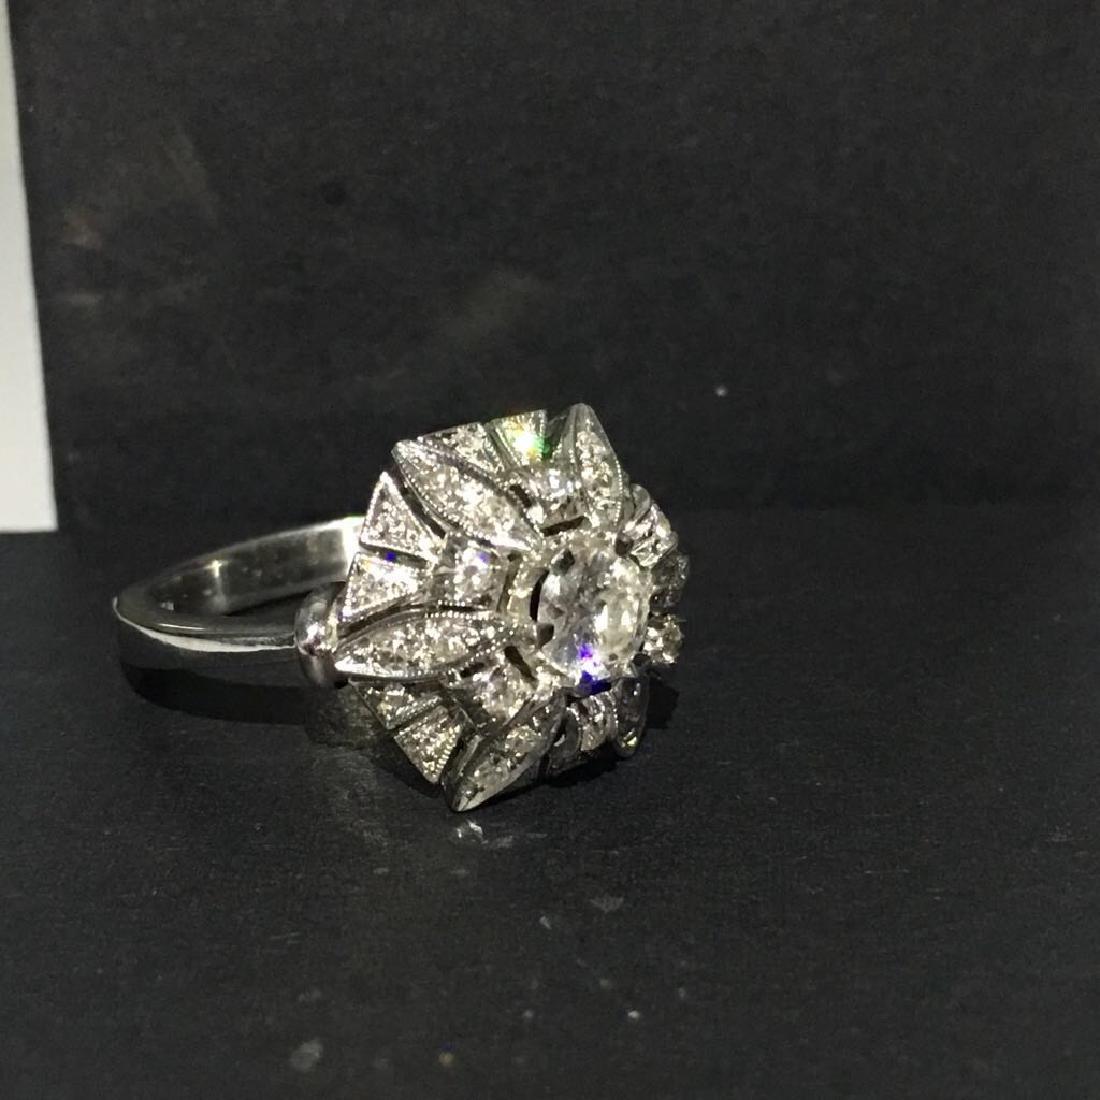 18K White Gold, 2.05 Carat VS-G Vintage Diamond Ring - 2